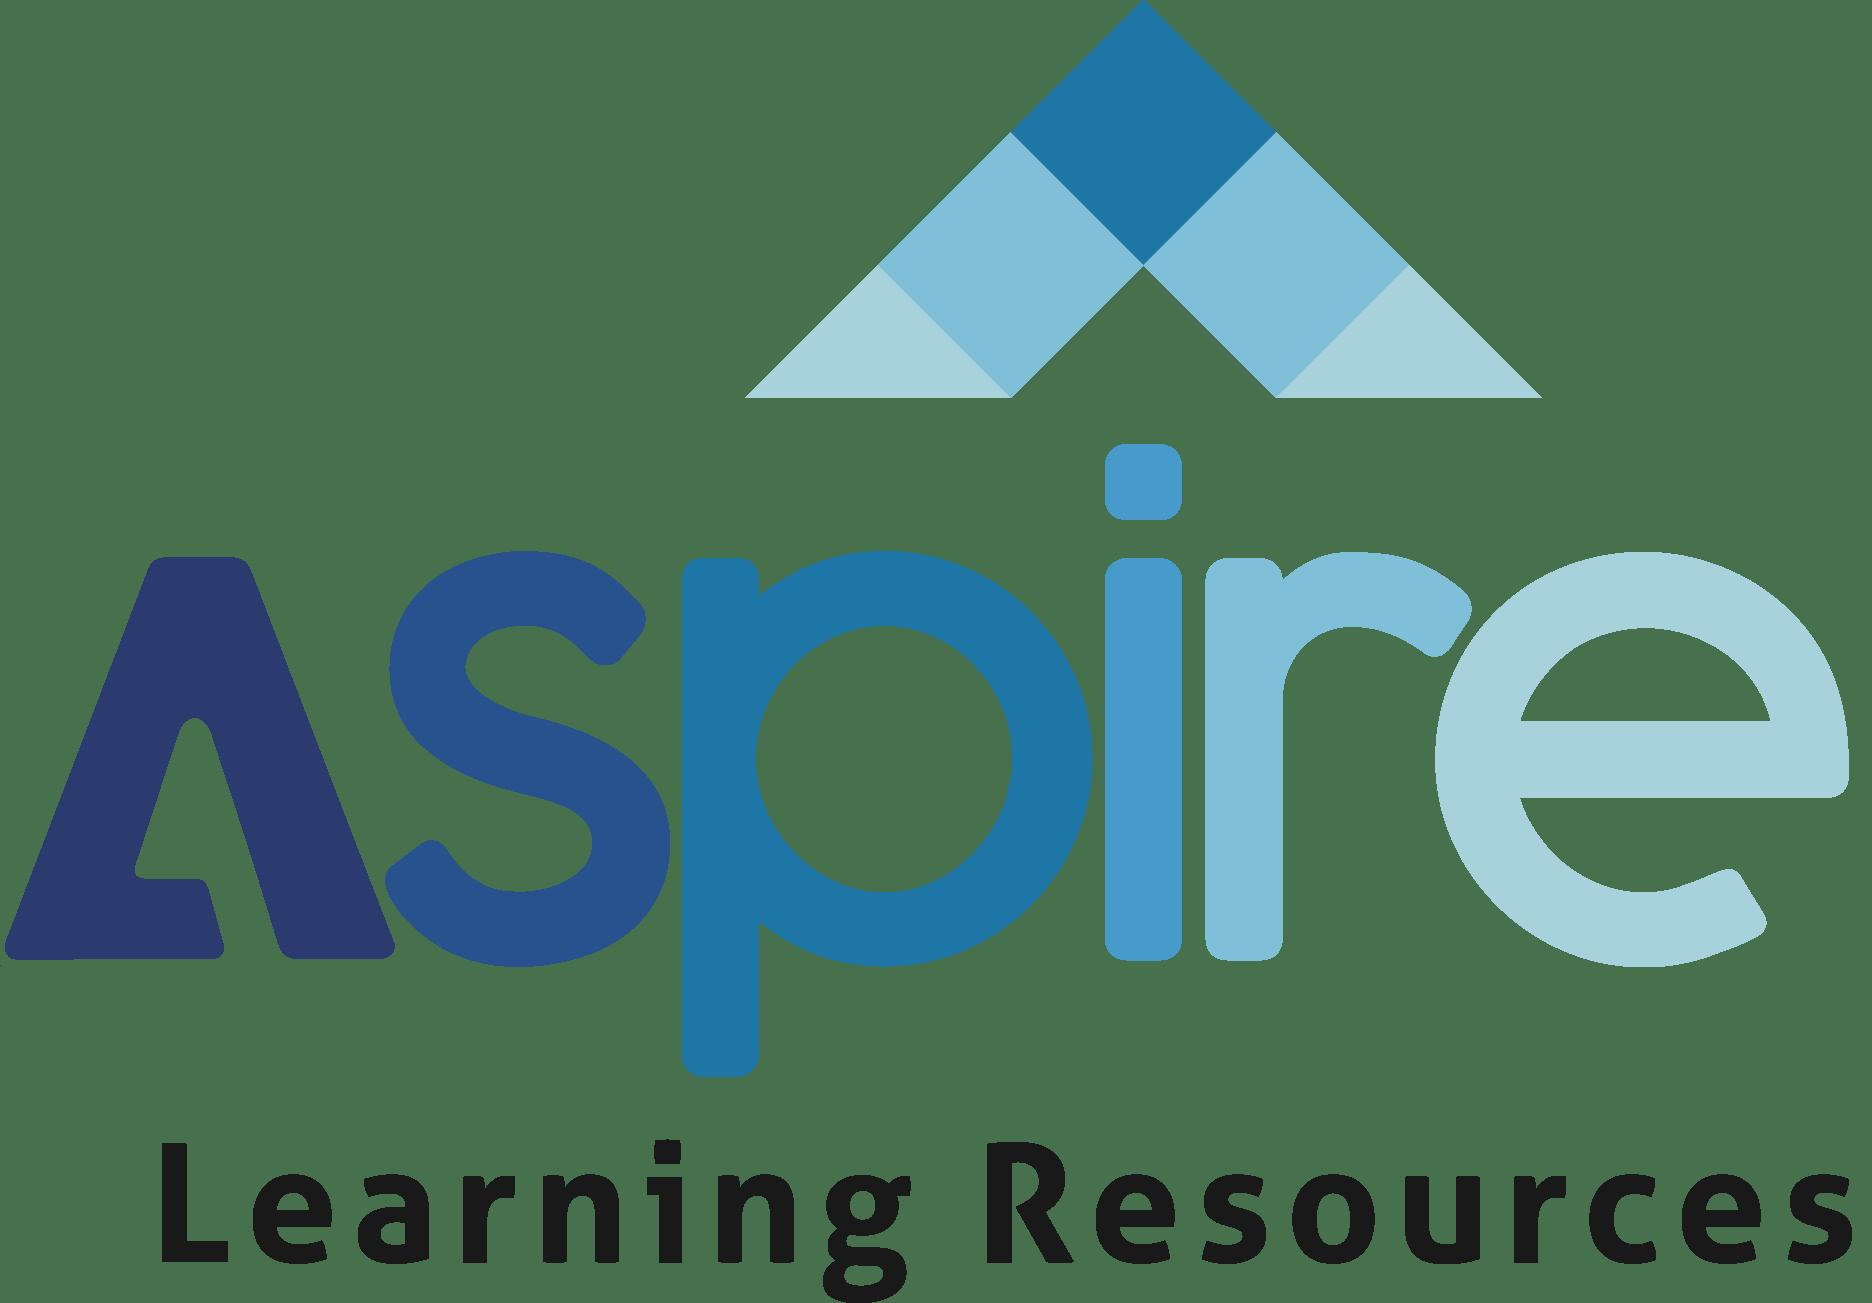 AspireLearningLogo-WEB